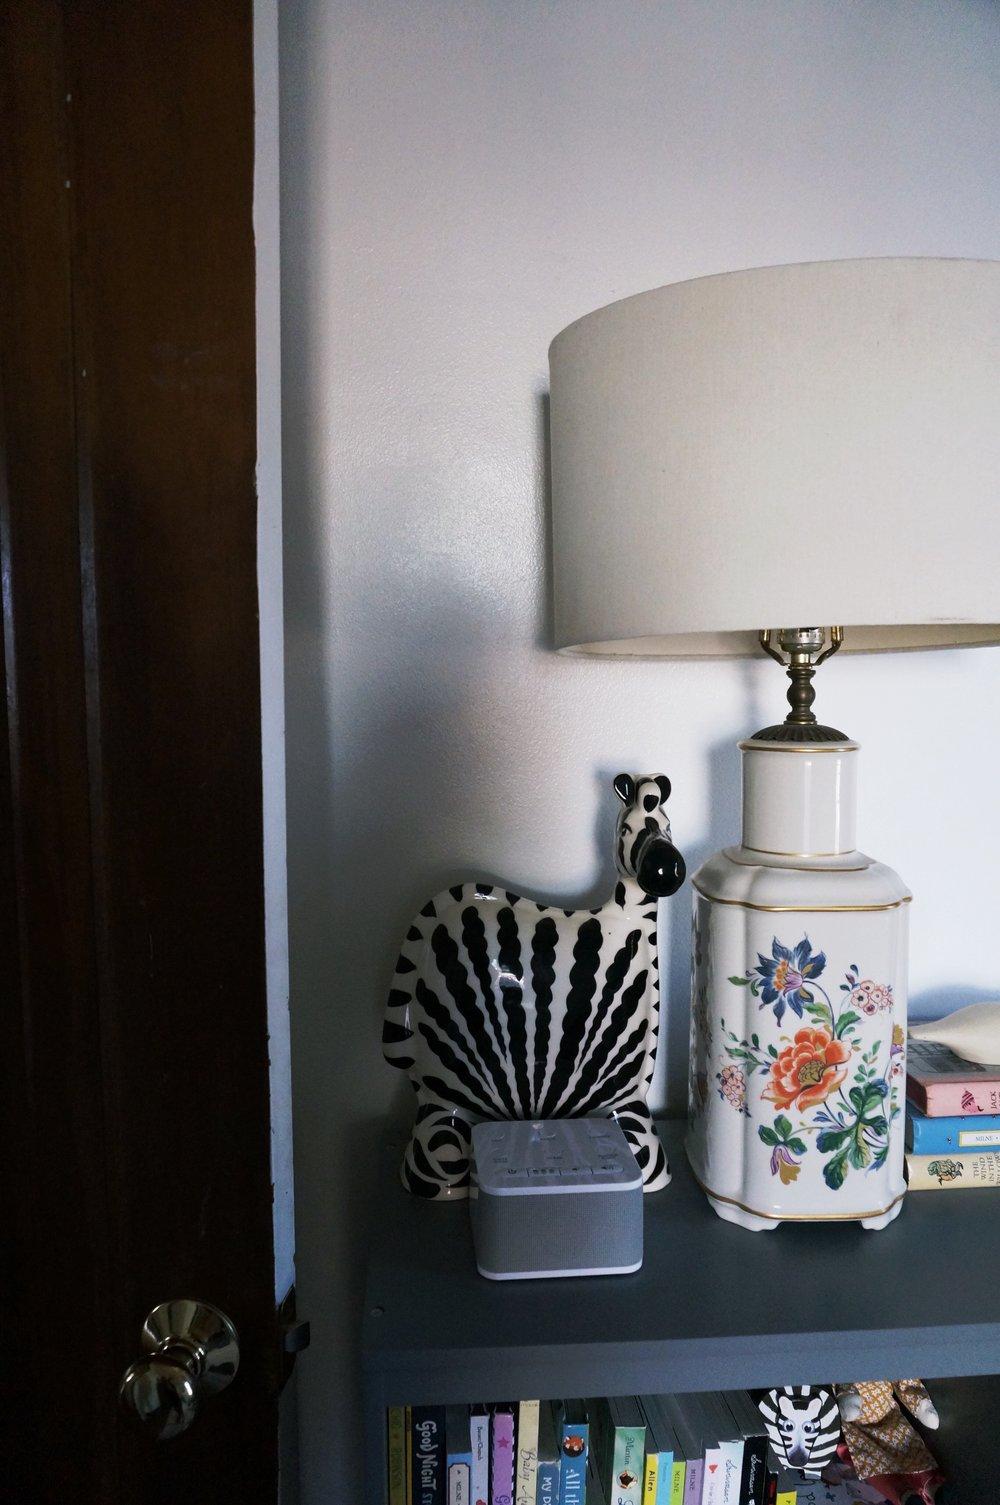 Penelope's Room (Lamp) | Cassia & Co.